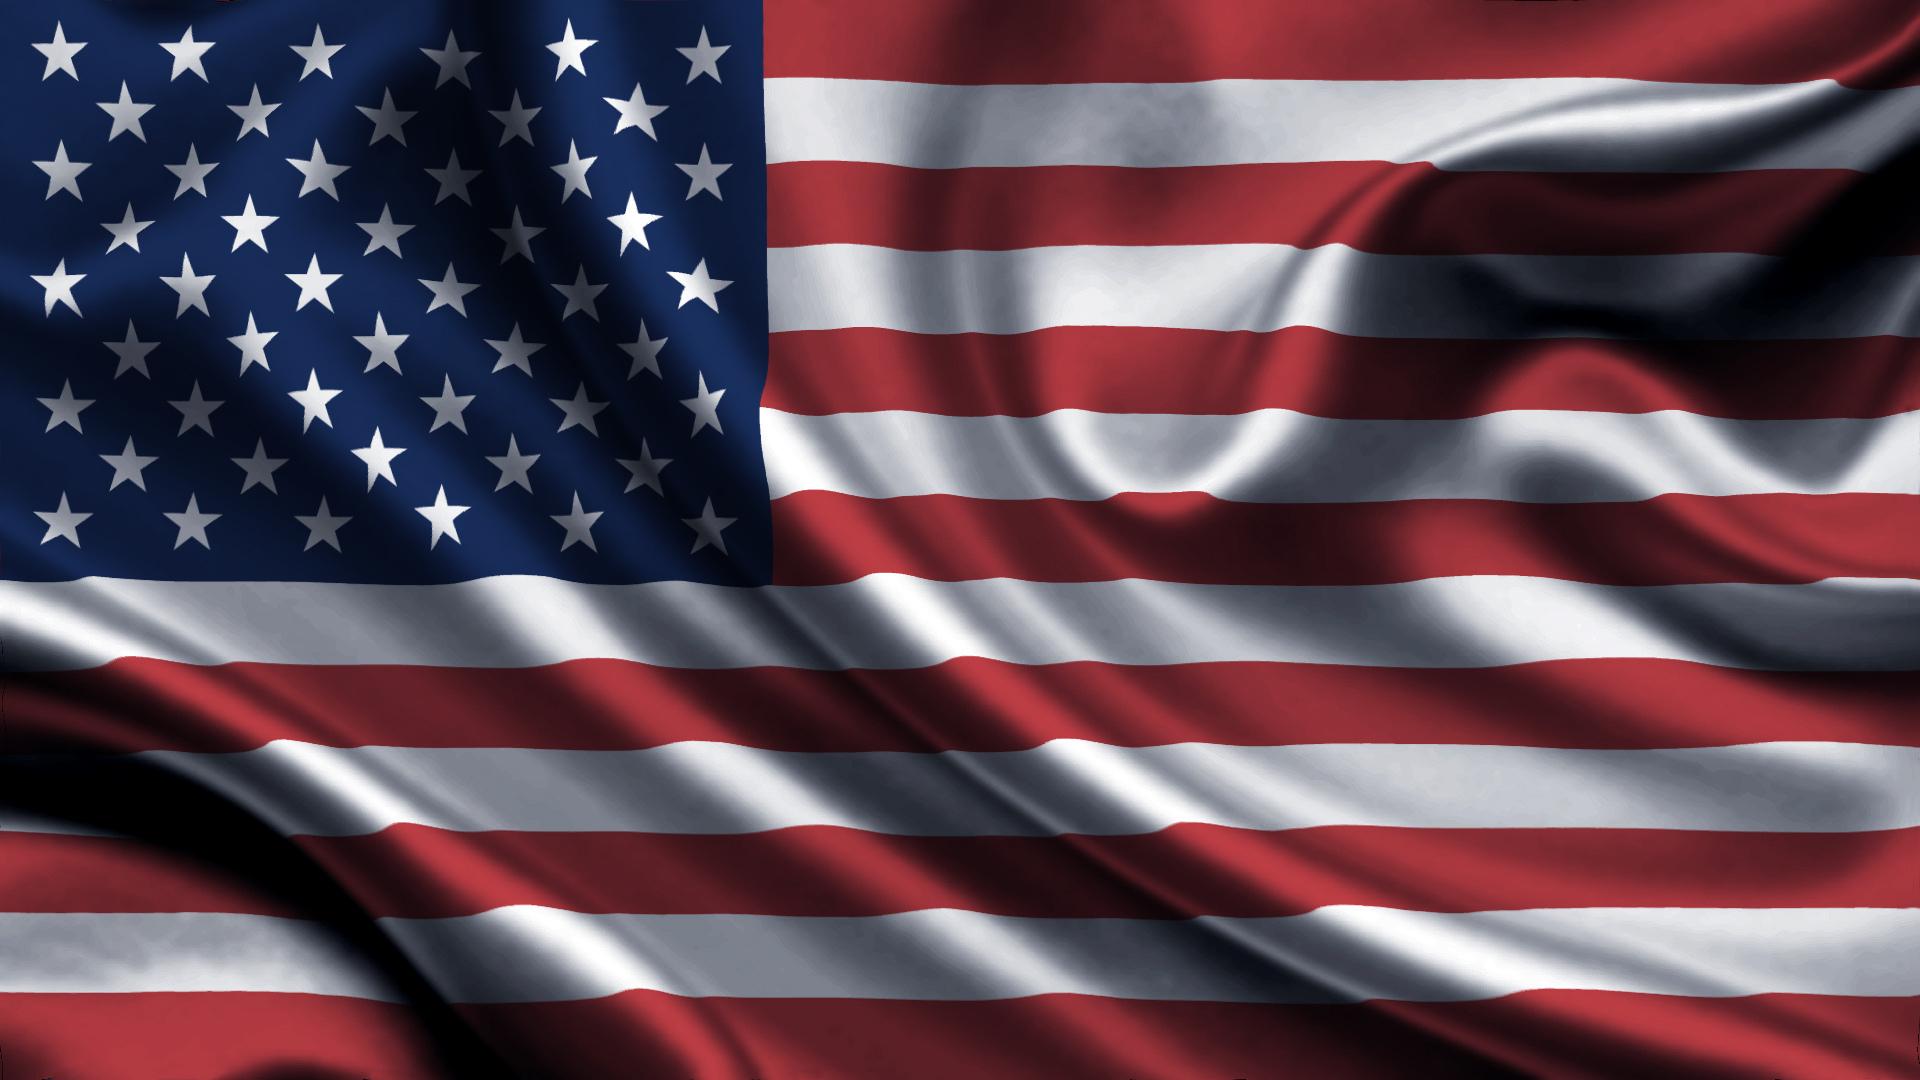 United States flag wallpaper 1920x1080 47362 WallpaperUP 1920x1080